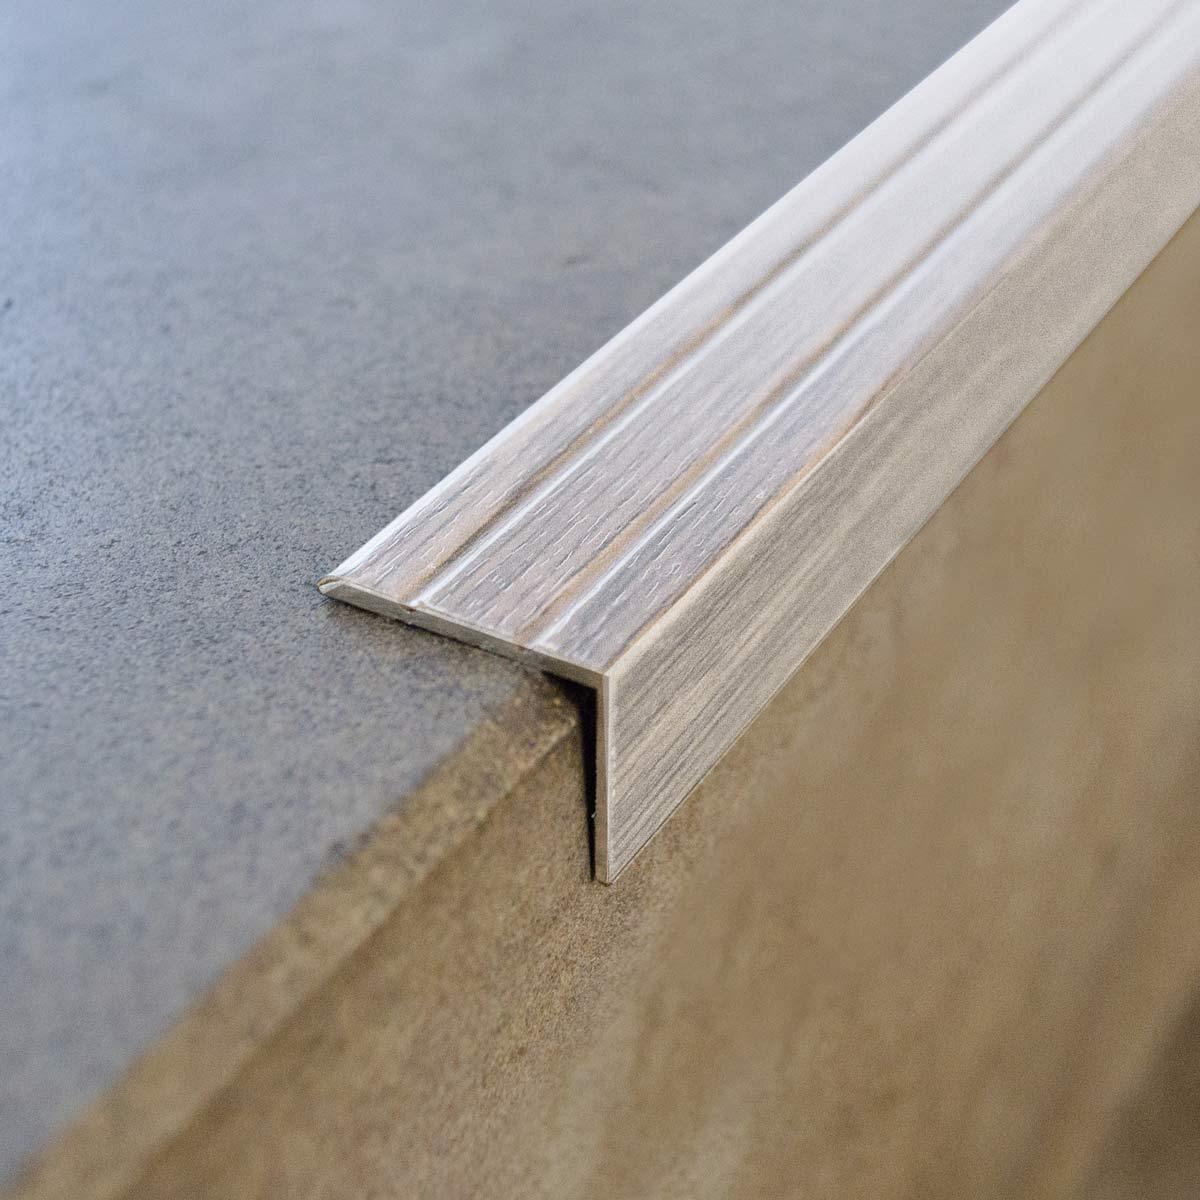 Profili per gradini Stairtec SL 20 ROA Profilitec